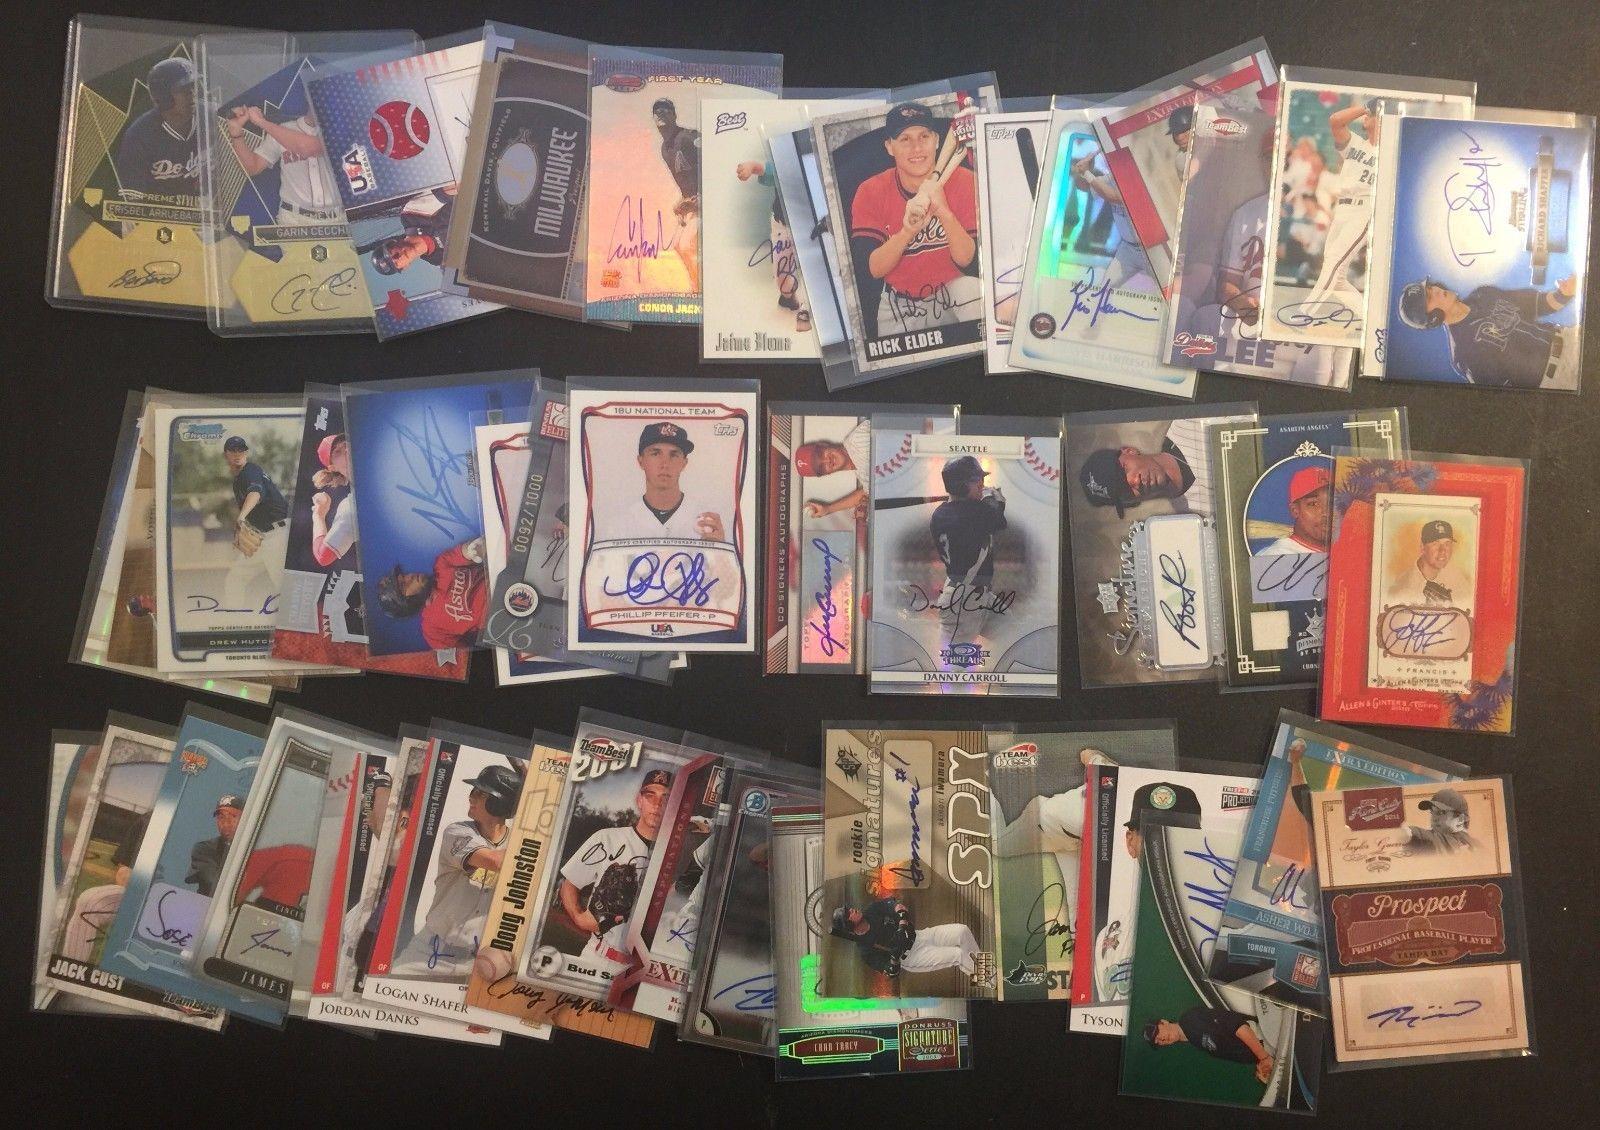 @Store_Club_Fan : Baseball AUTOGRAPH 50 Card Random Lot AUTO Topps Supreme Bowman Panini Chrome https://t.co/s2Mc51T9Tq https://t.co/4E1MjPKoBv